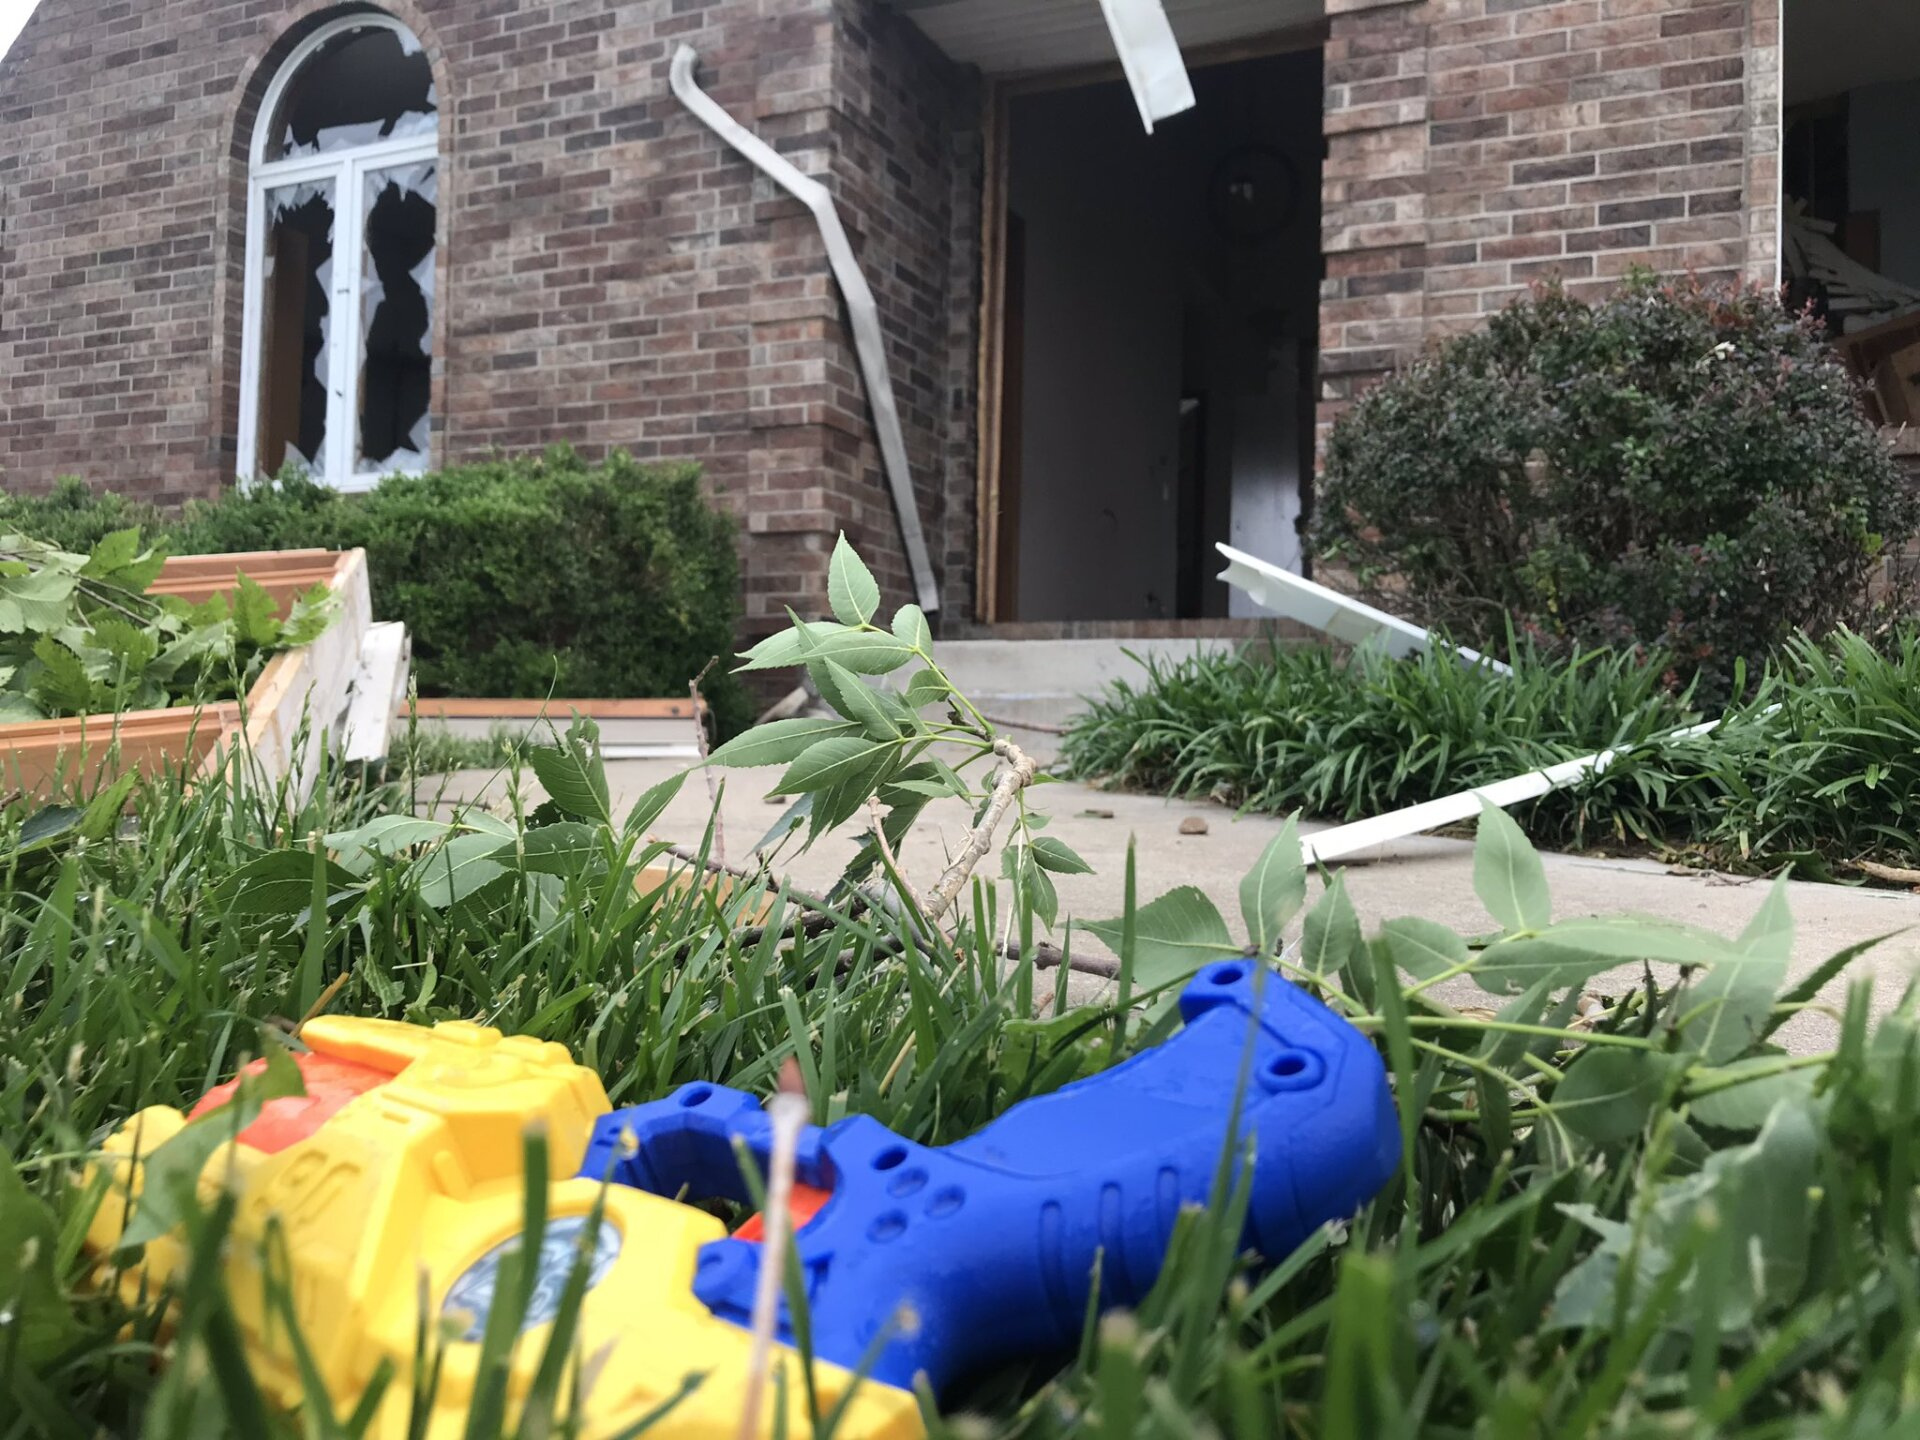 linwood tornado damage 5